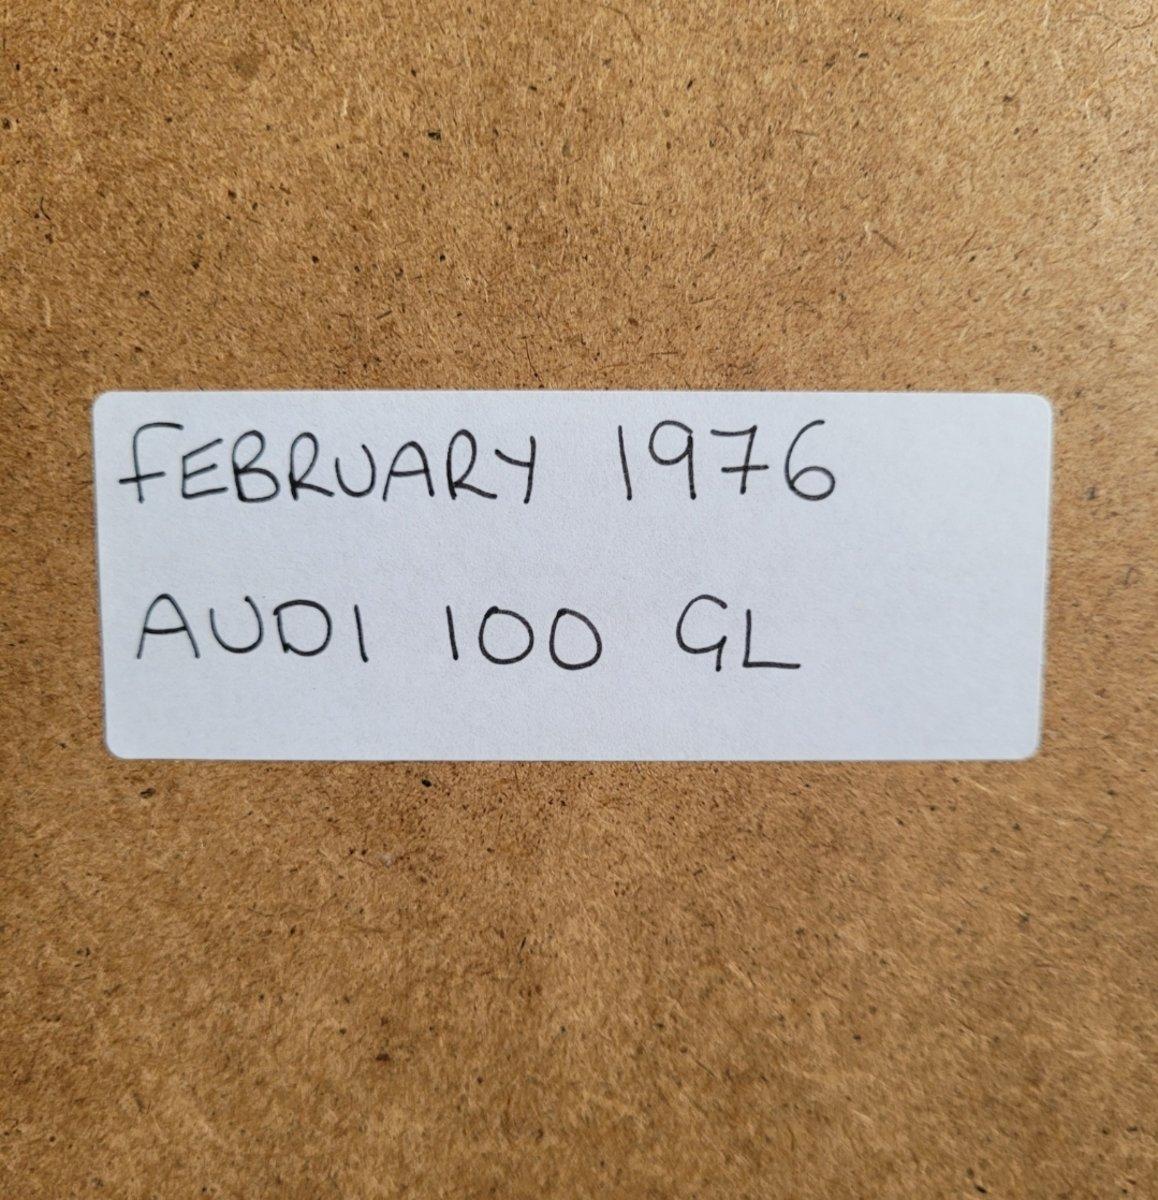 1977 Original 1976 Audi 100 Framed Advert For Sale (picture 2 of 3)